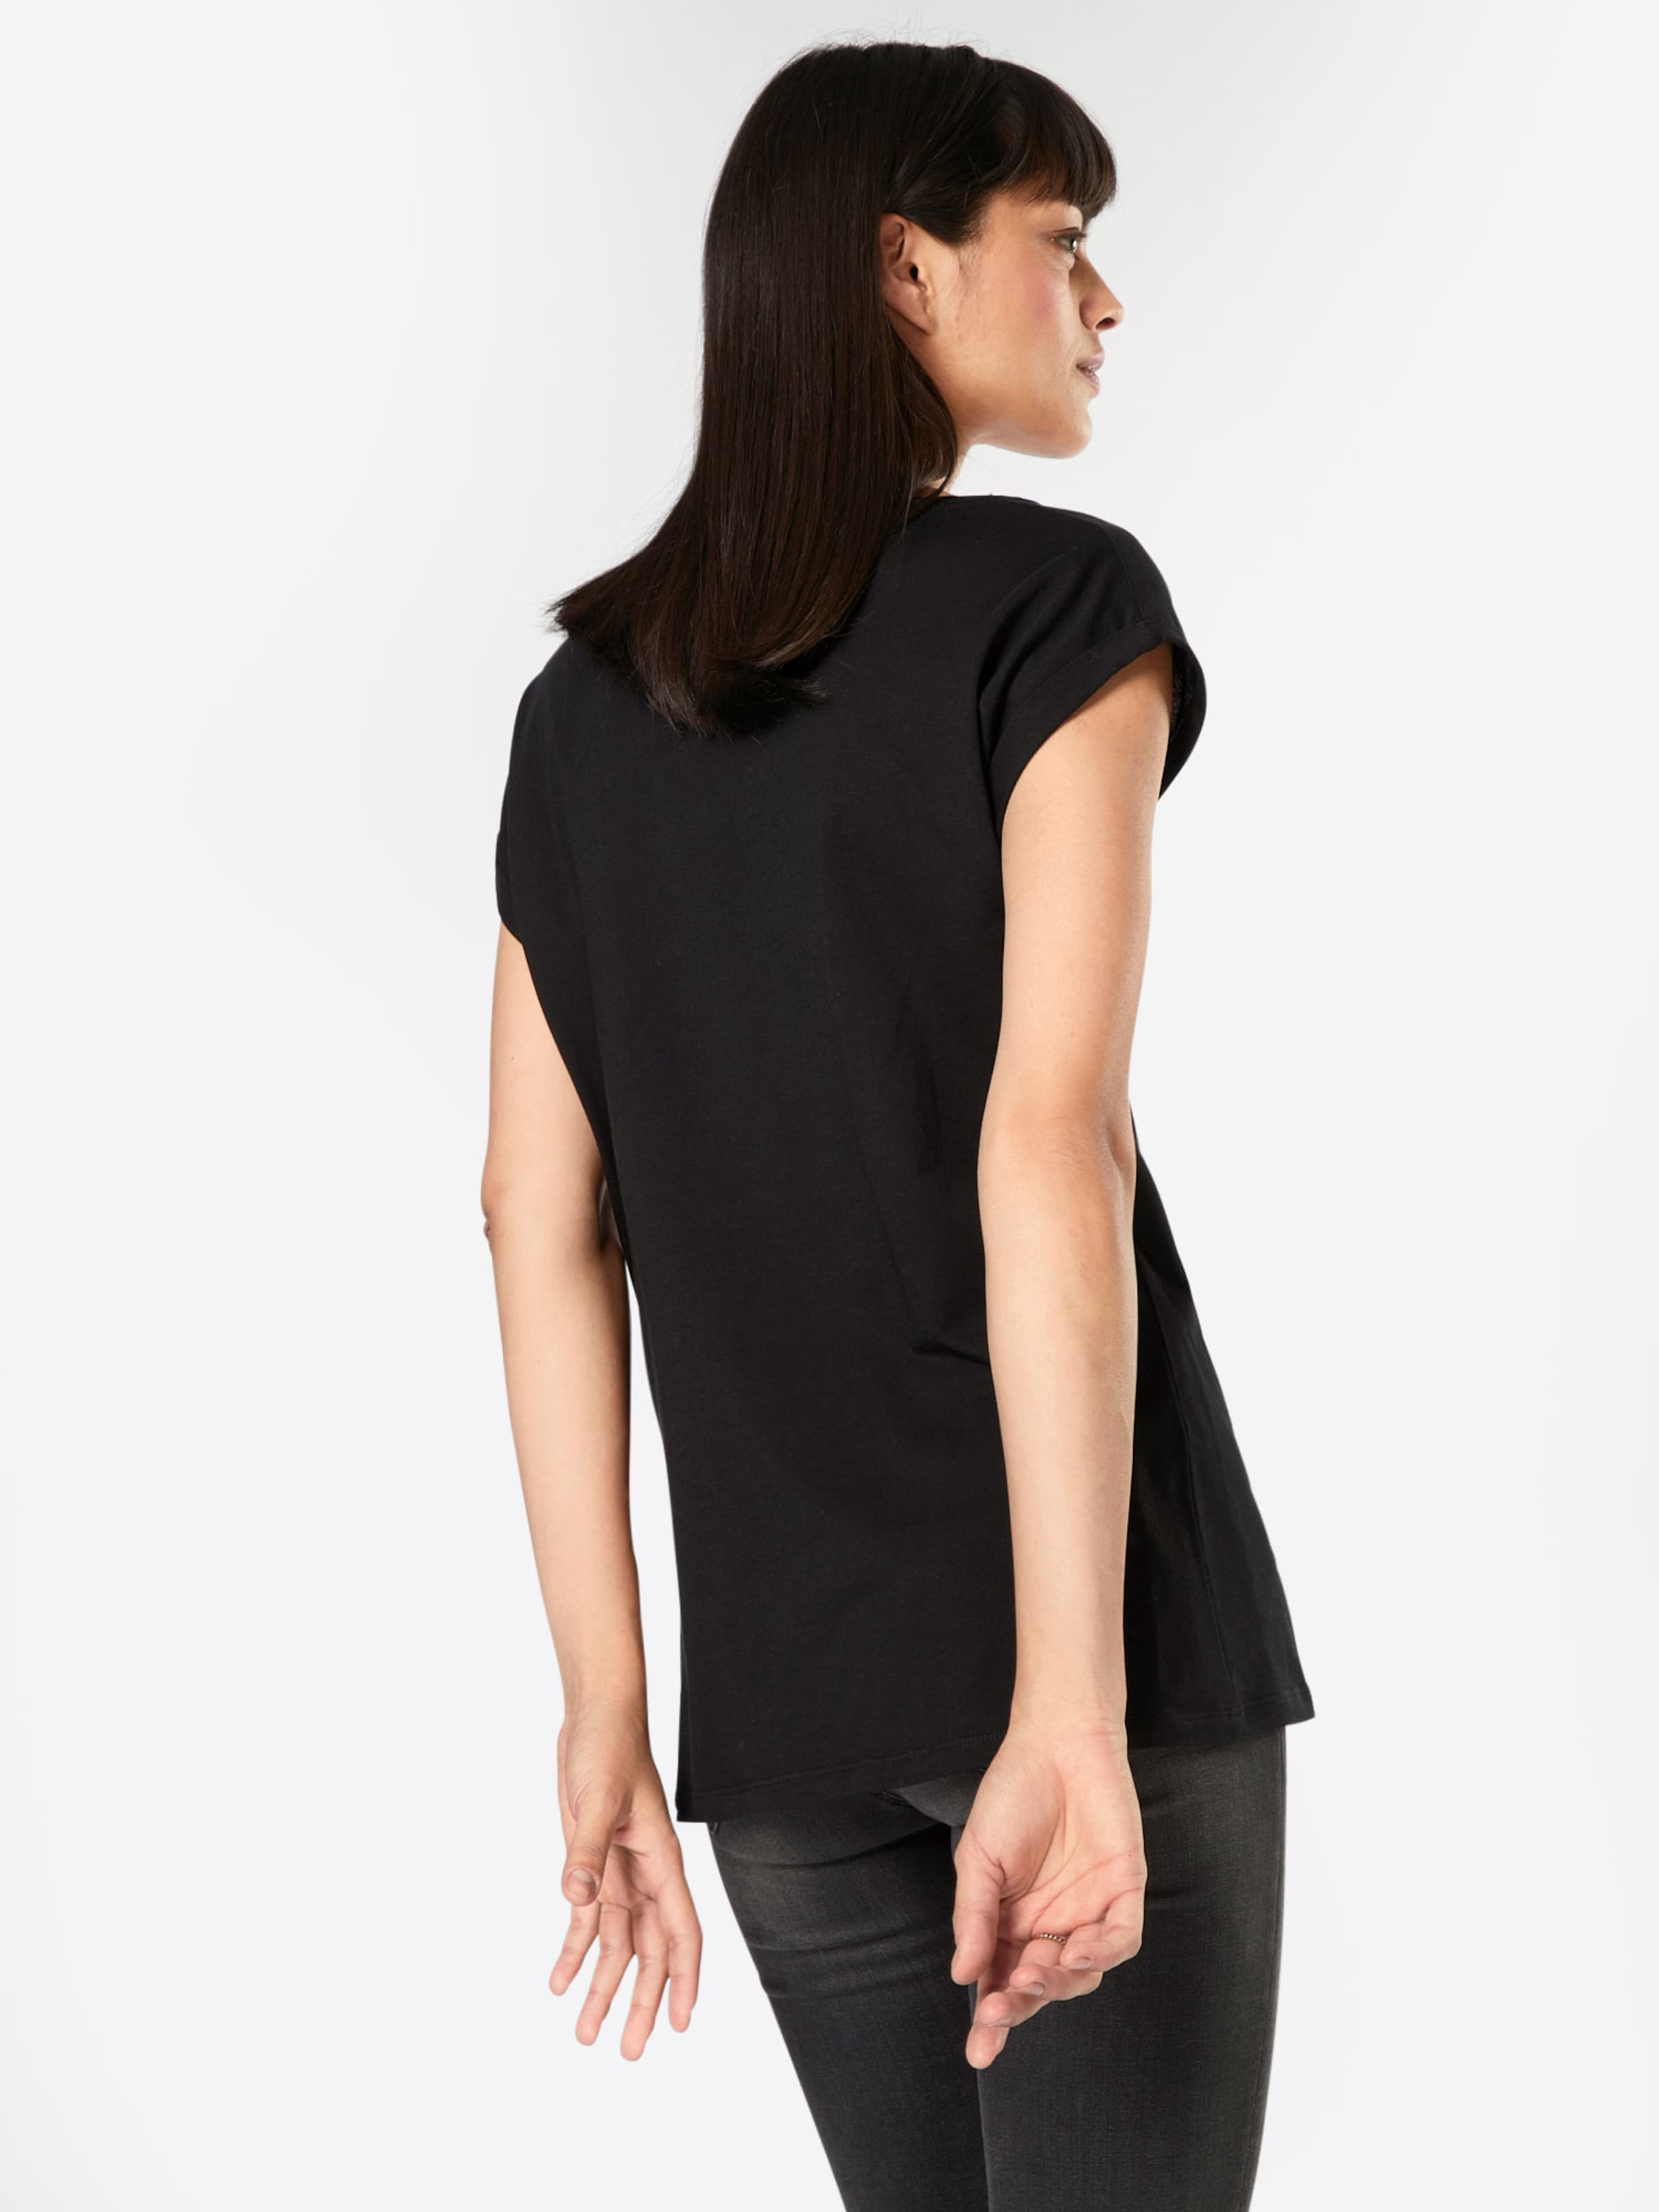 Shirt 'evolution' Iriedaily Shirt Iriedaily 'evolution' ZwartWit In 7gfb6vYy